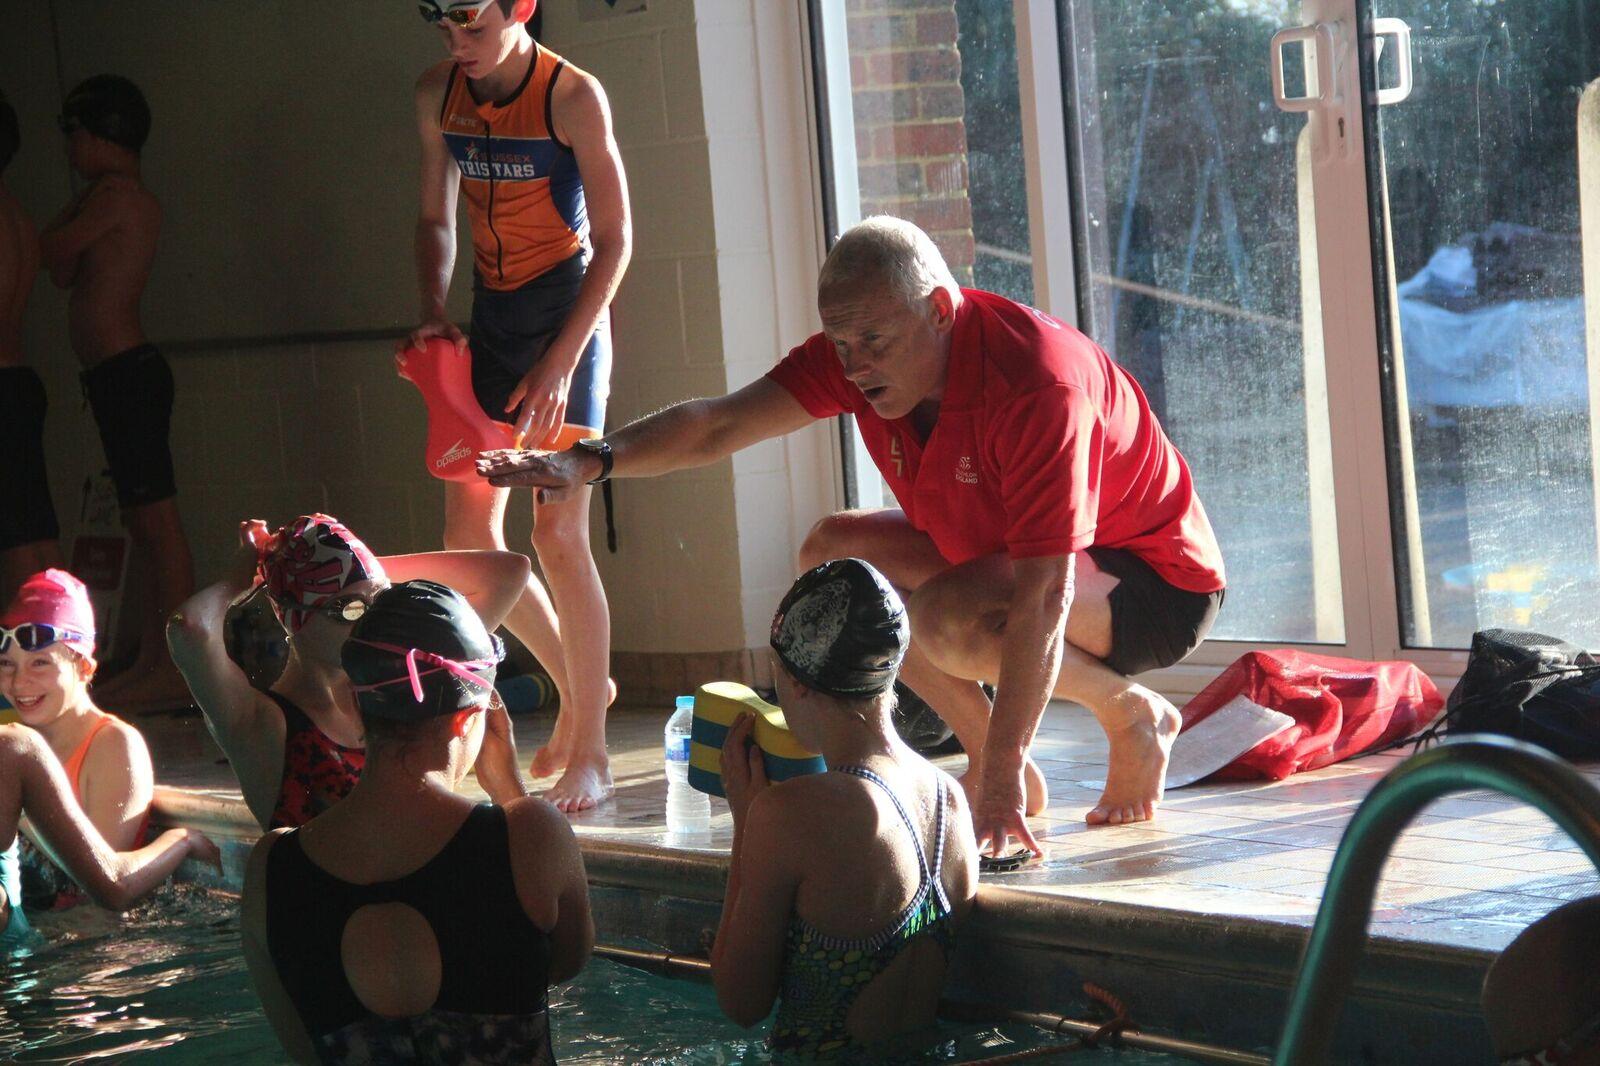 Seizing a coaching moment